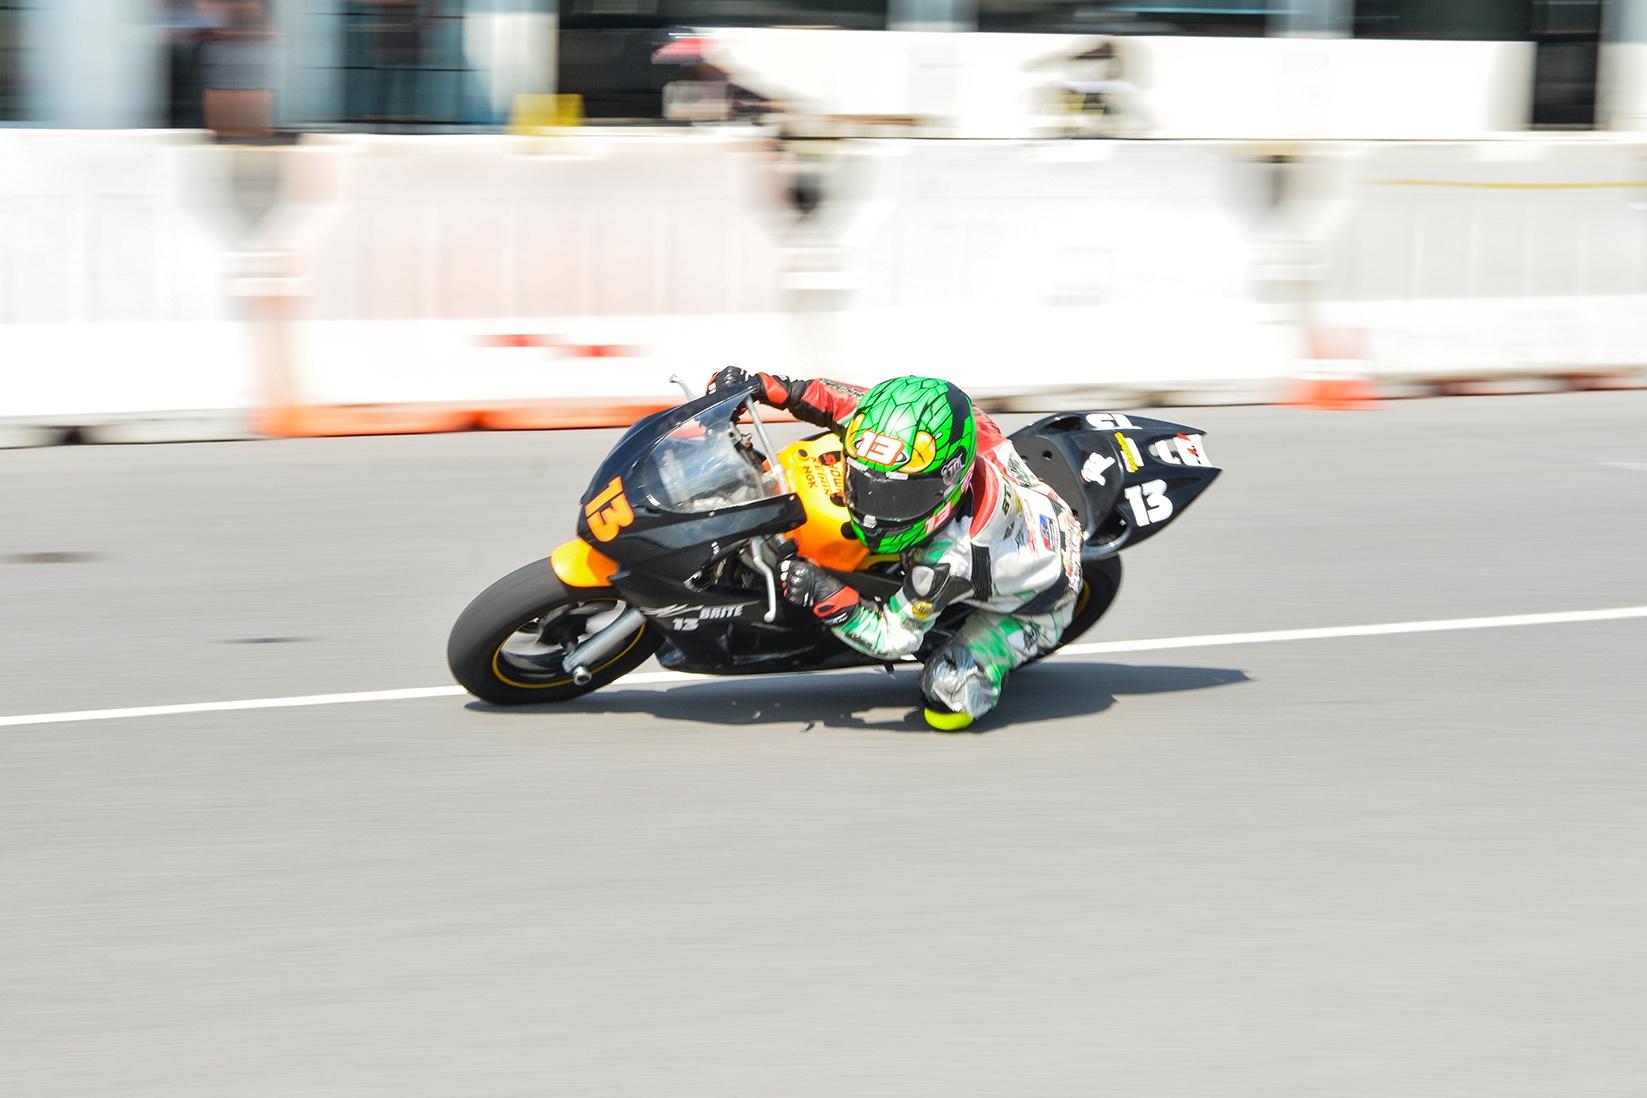 Giai dua moto tre em o Thai Lan va nhung giac mo MotoGP hinh anh 26